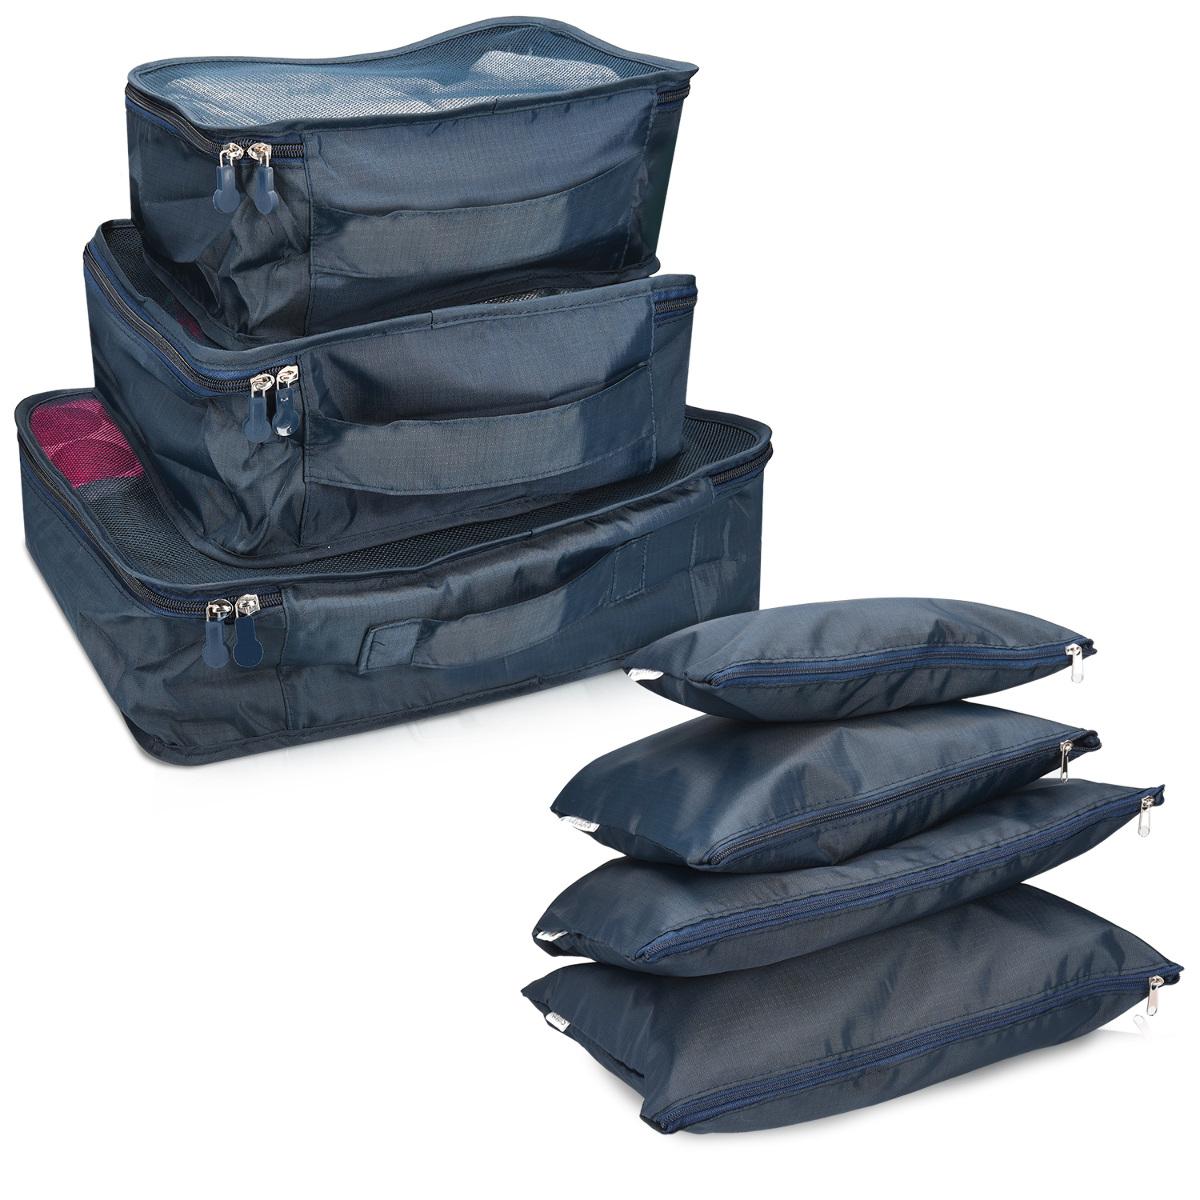 Set-de-7x-organizadores-de-maleta-bolsas-para-equipaje-packing-cubes